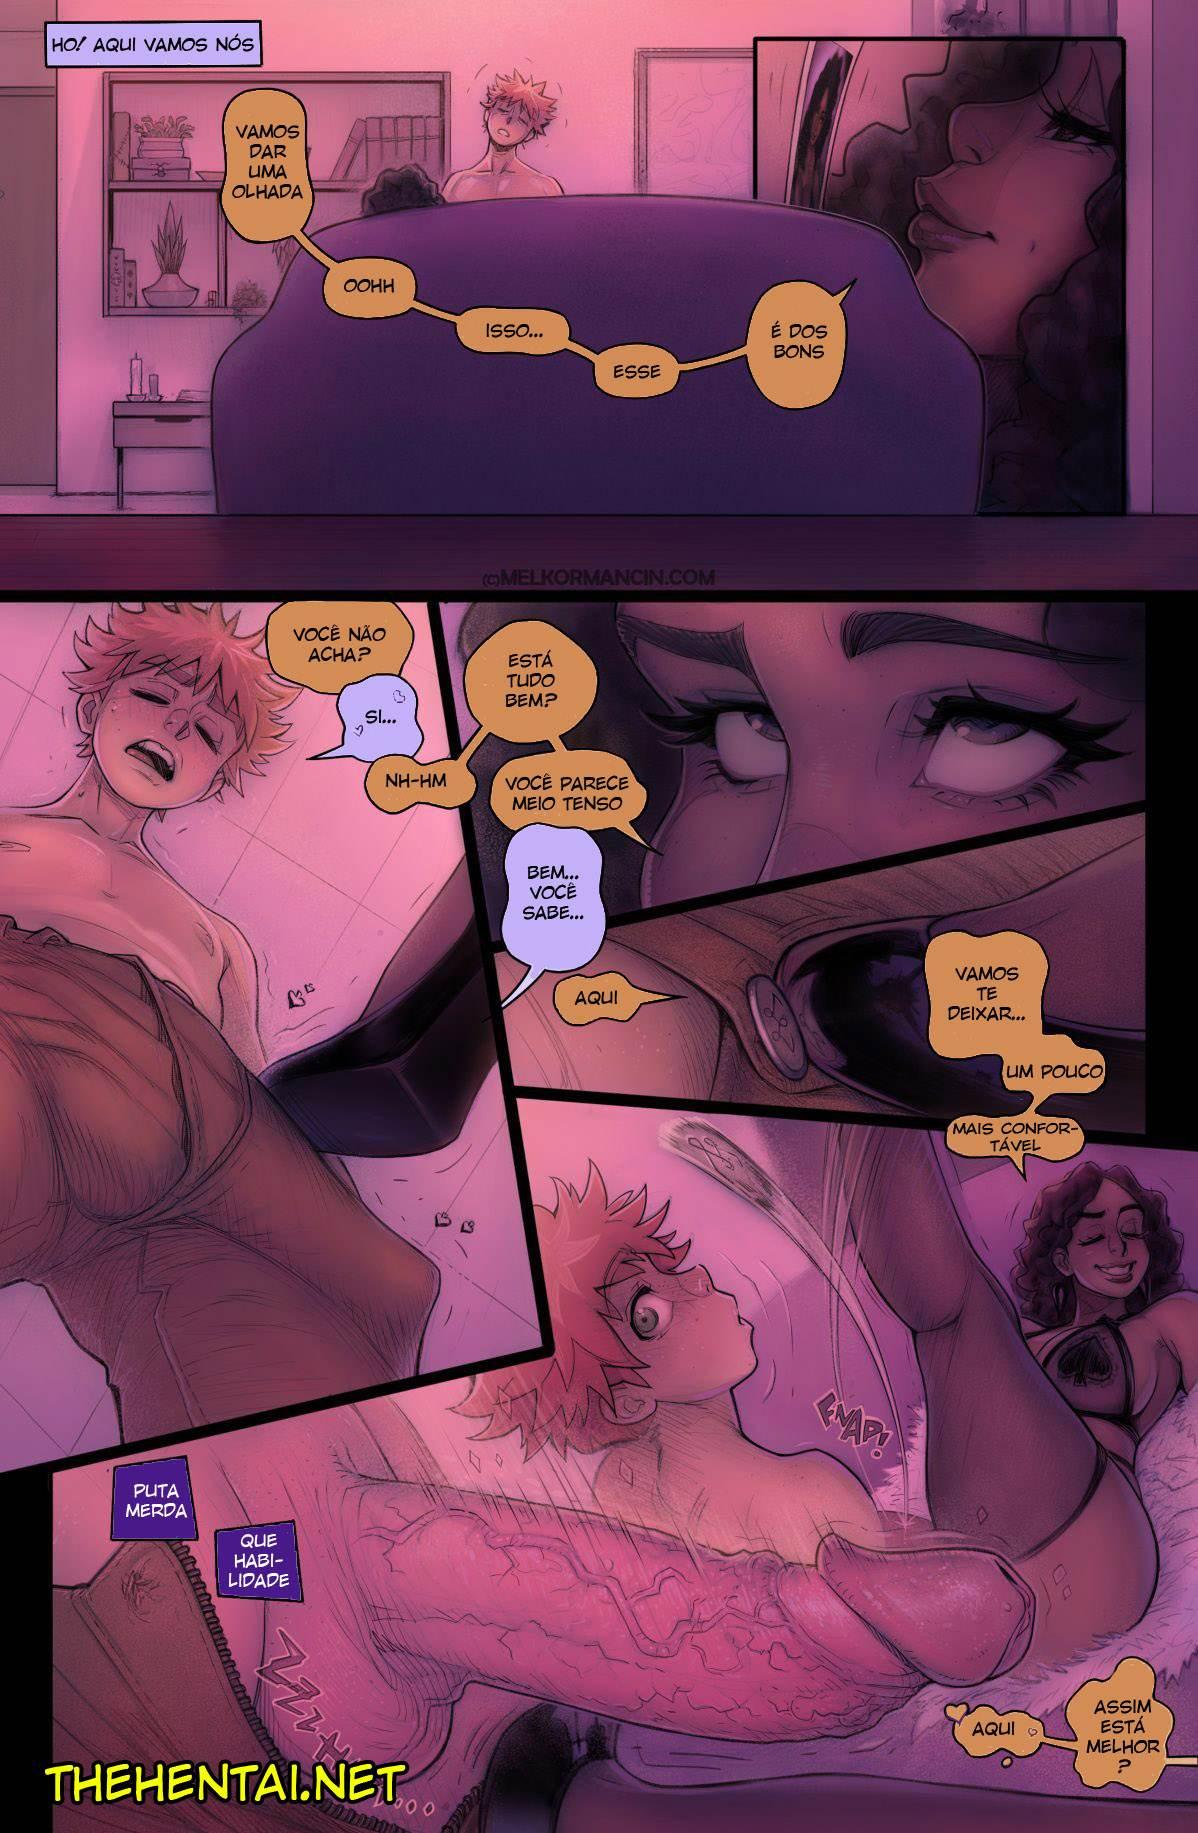 Spades Melkor Mancin Hentai pt br 13 - hentai, exclusiva, comics-hq